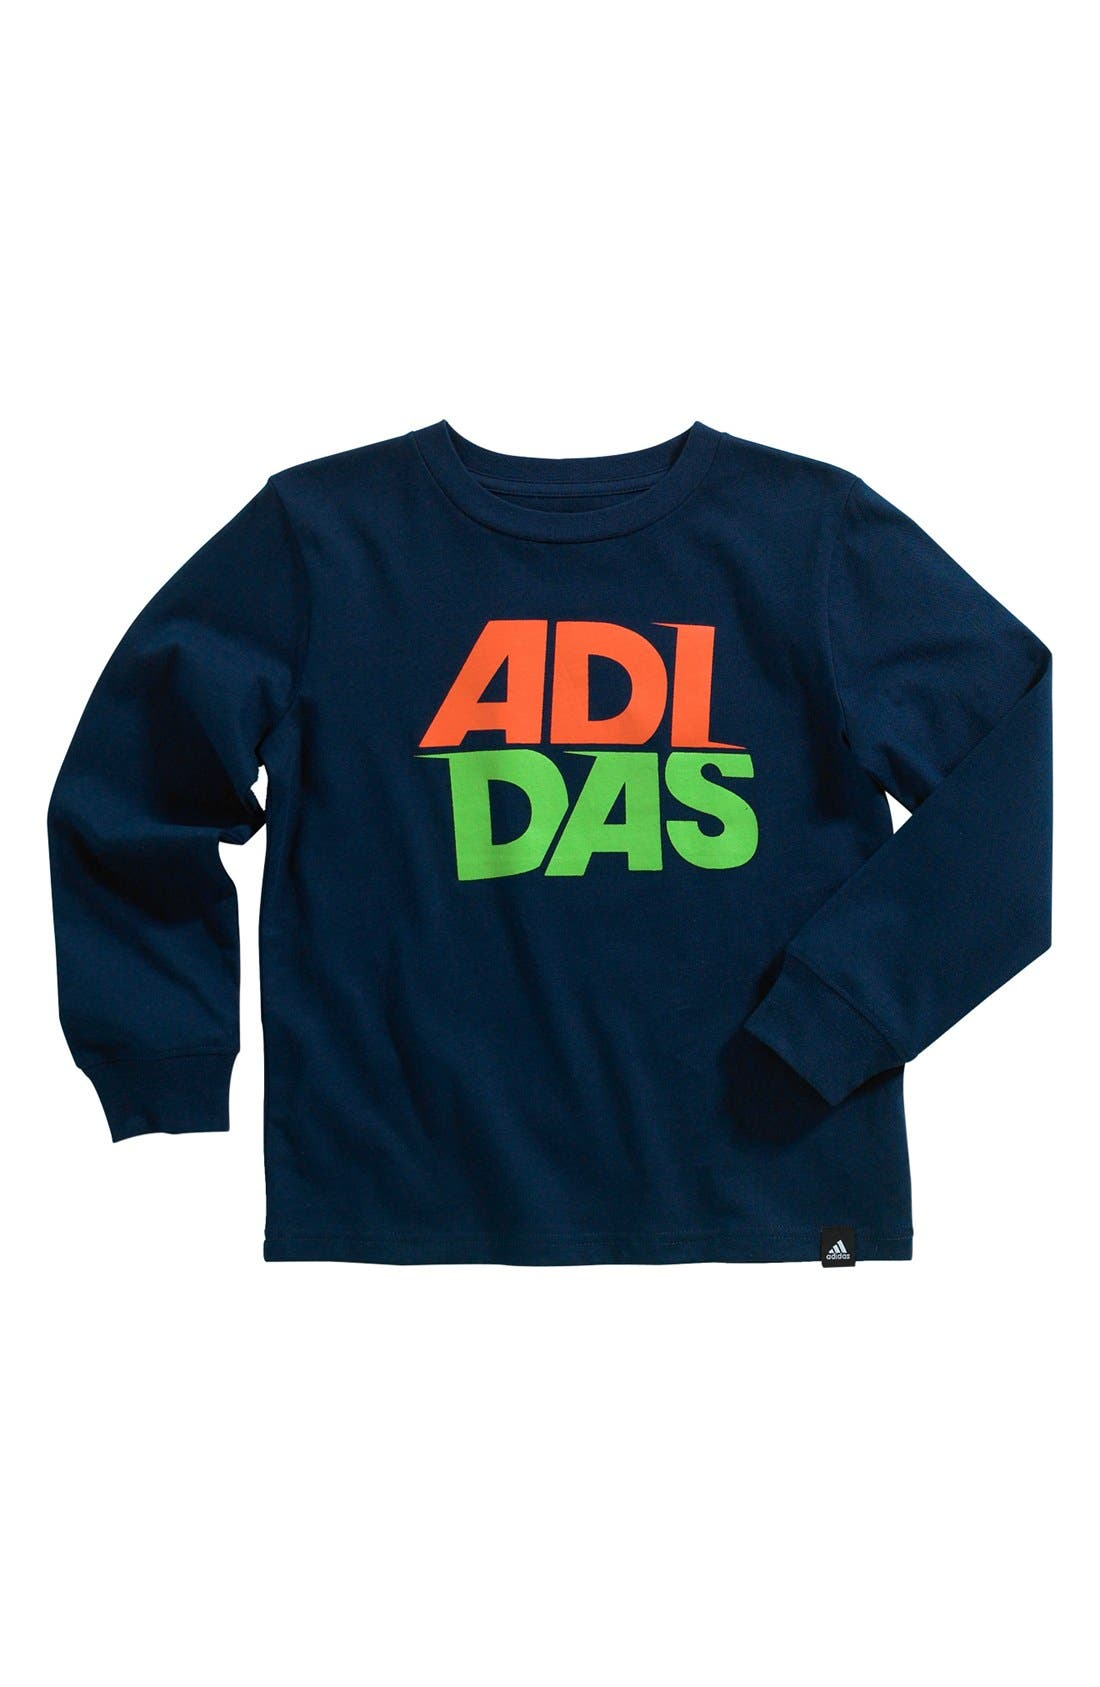 Alternate Image 1 Selected - adidas 'Motion' T-Shirt (Little Boys)